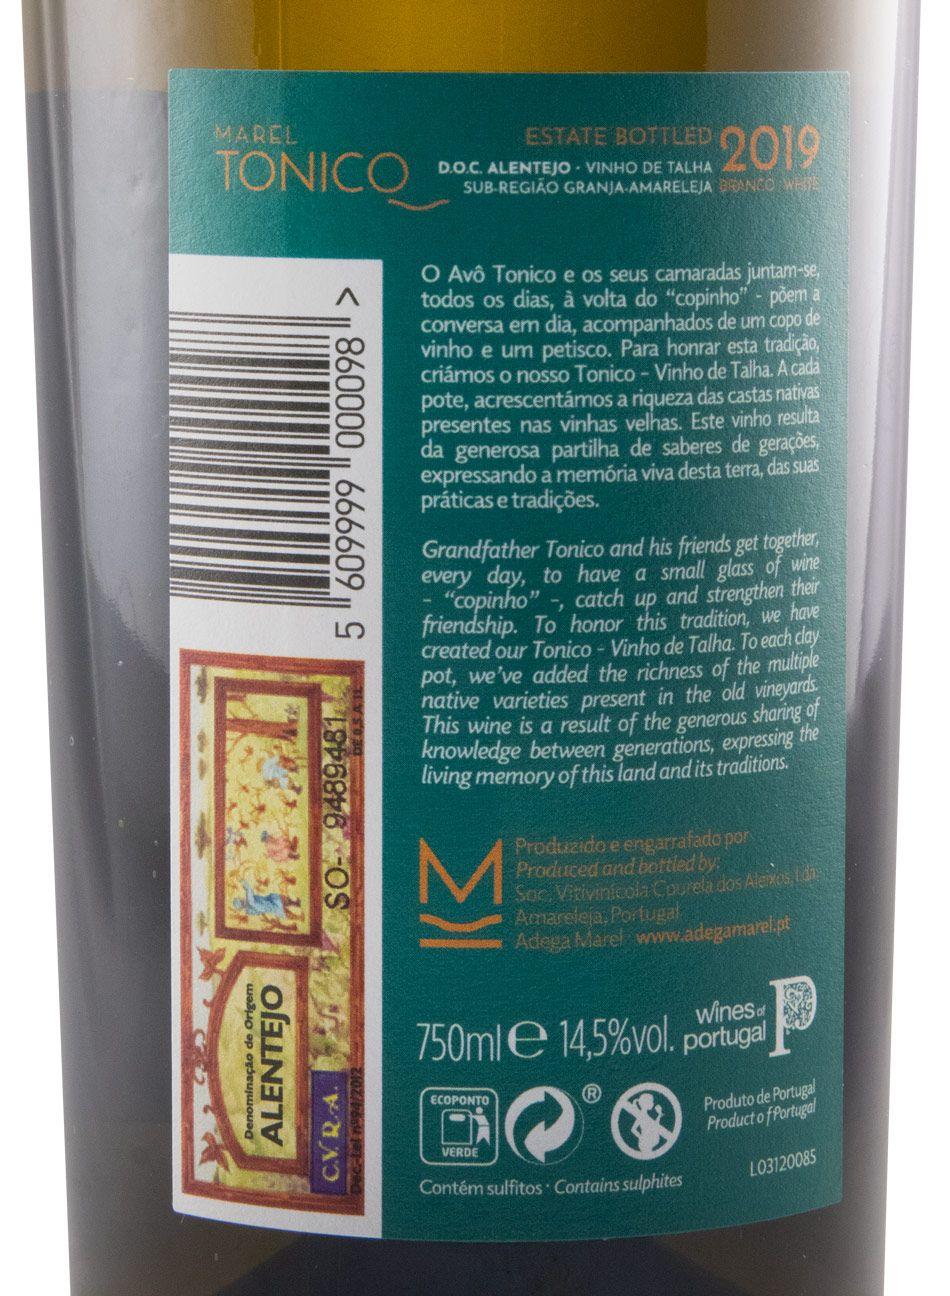 2019 Tonico Vinho de Talha white